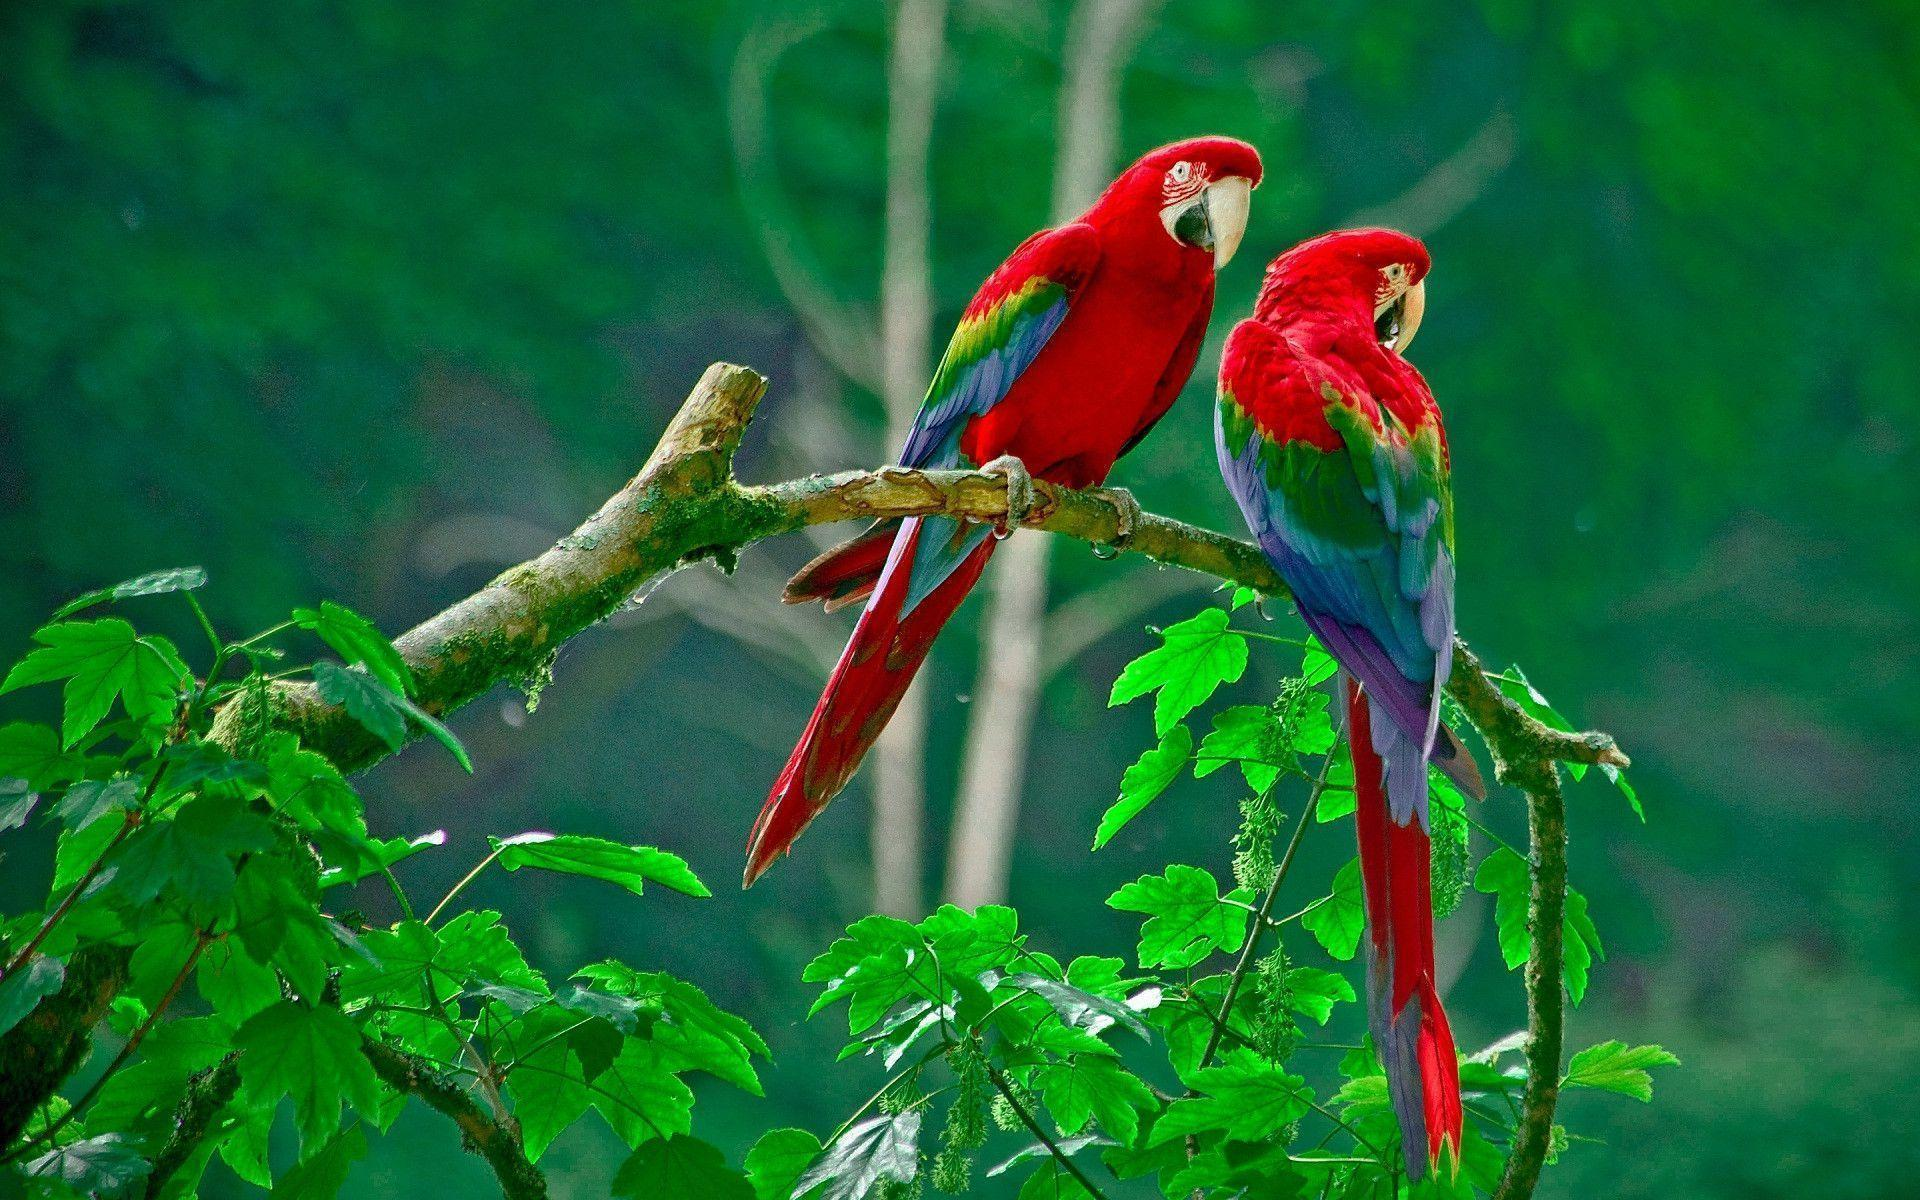 Wallpaper Gallery Love Bird Wallpaper: Wallpapers Love Birds